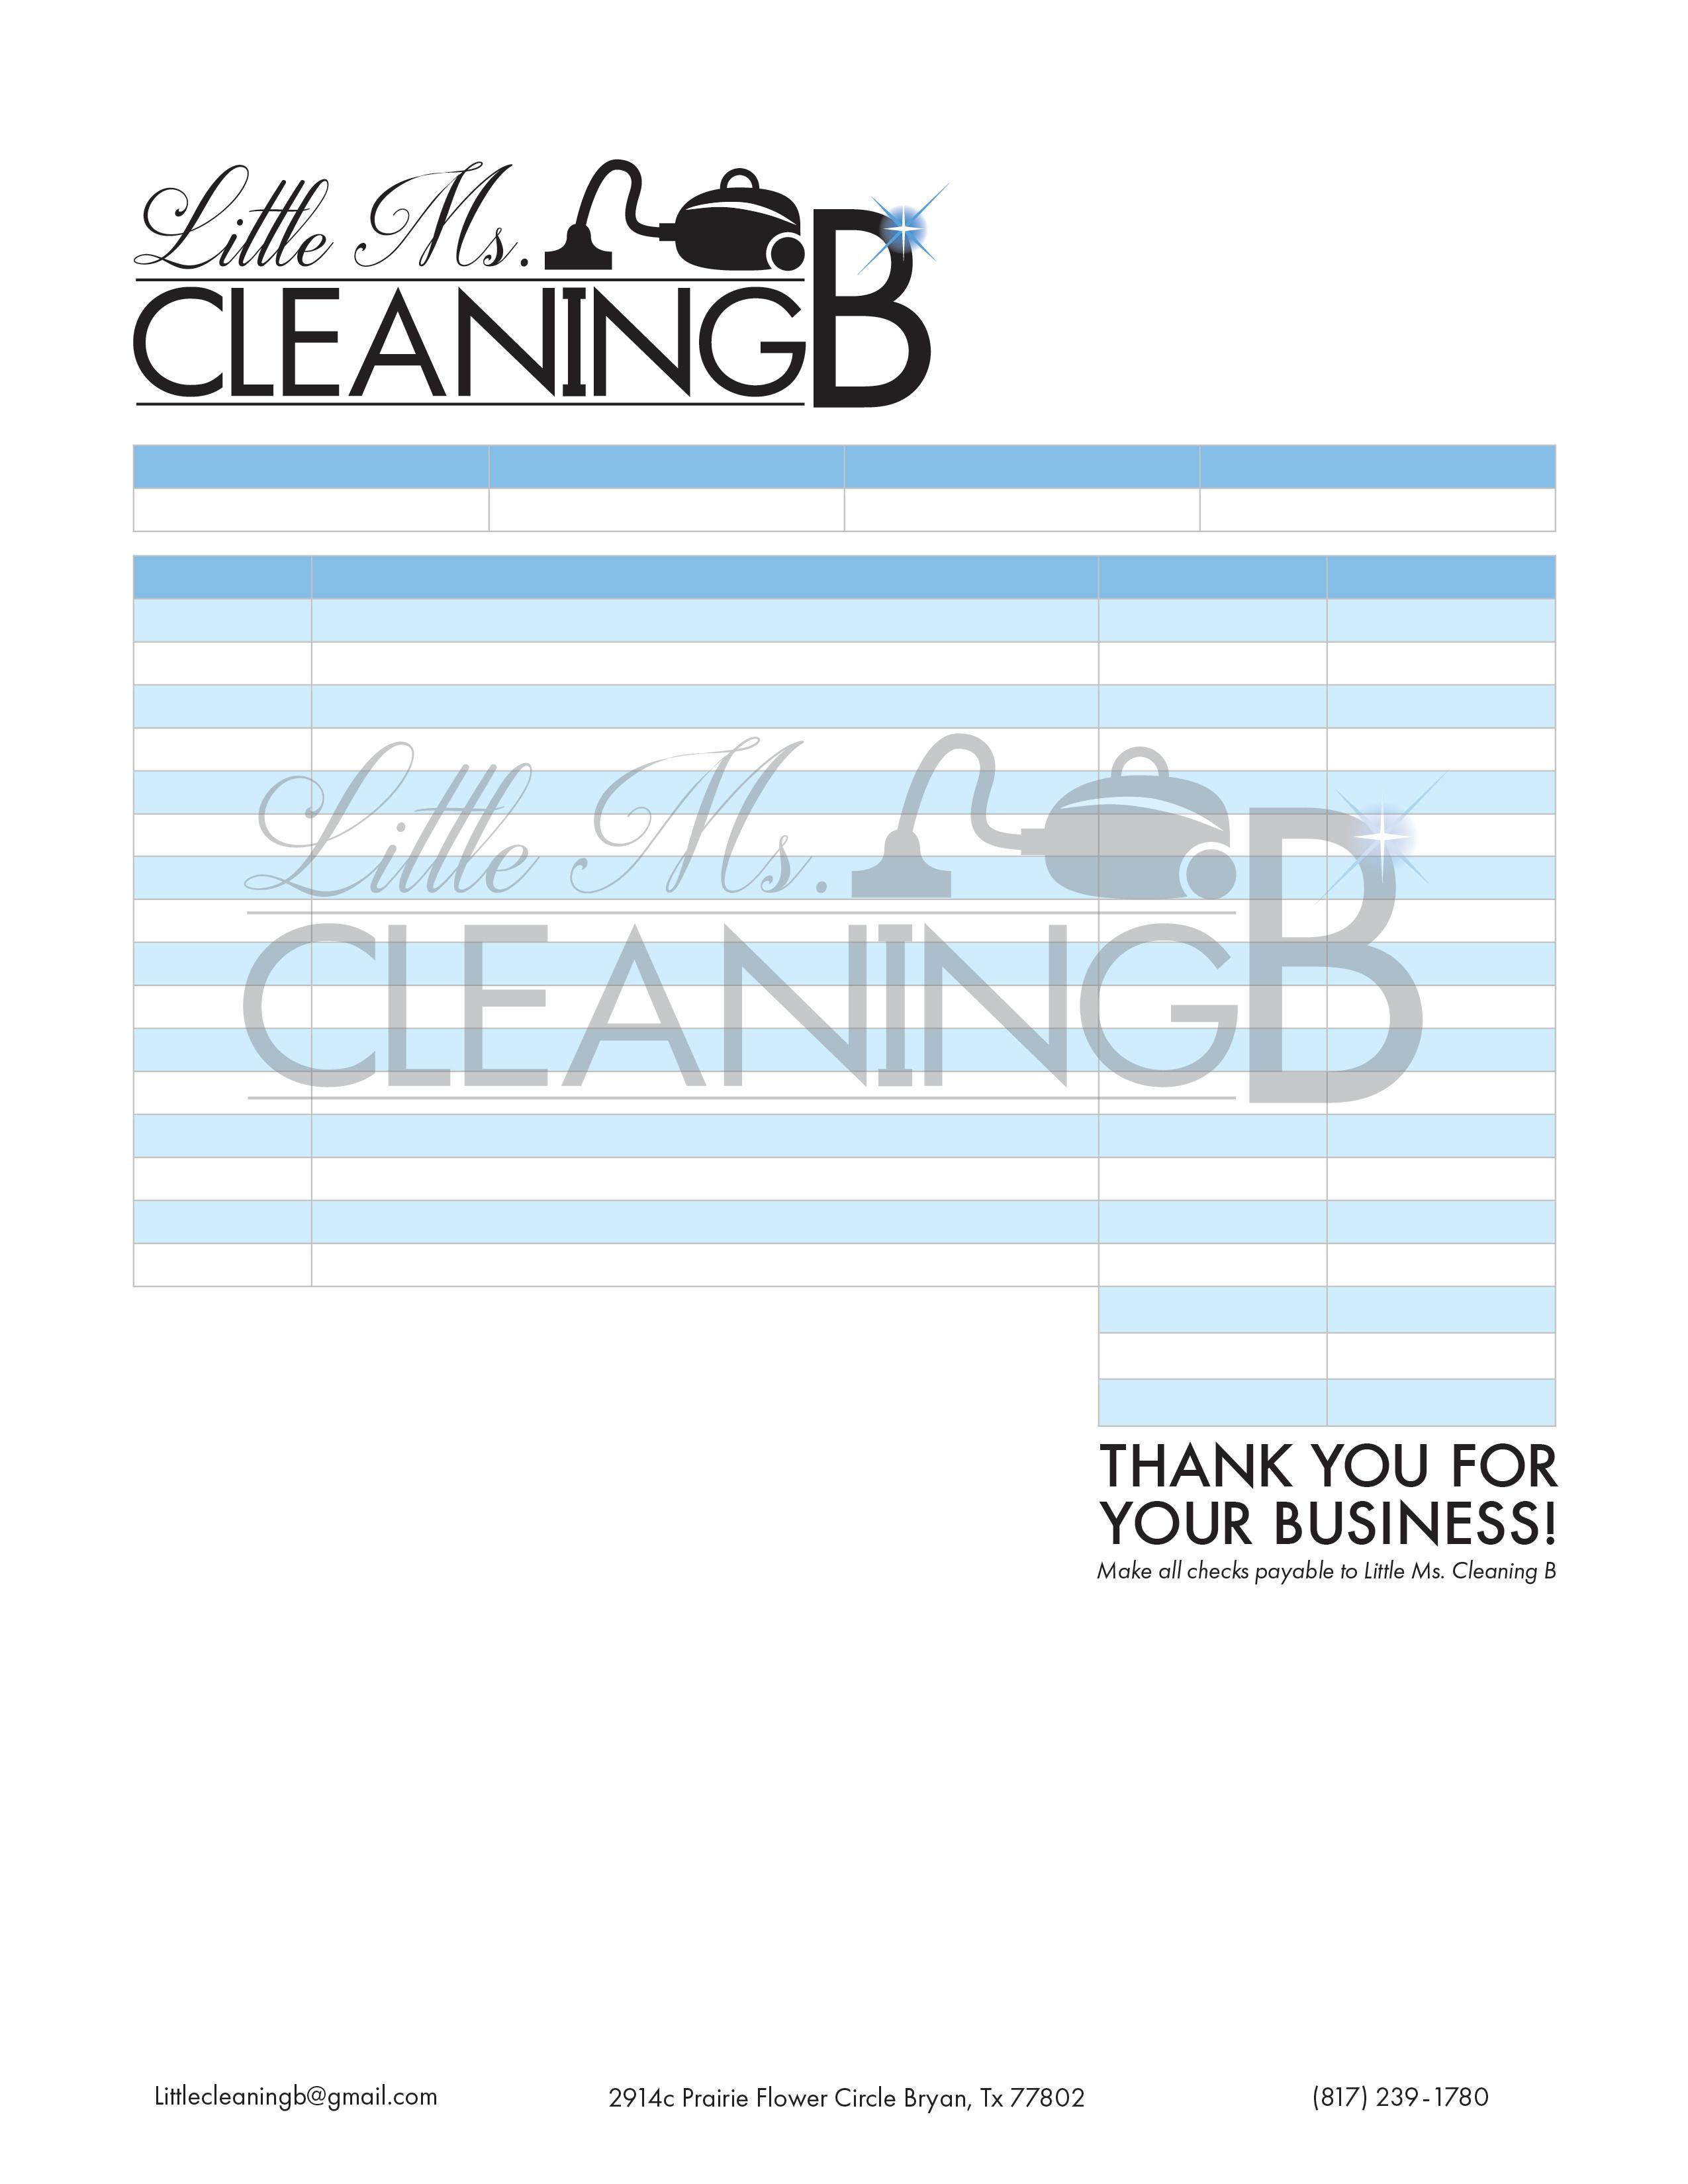 LMCB Invoice Background